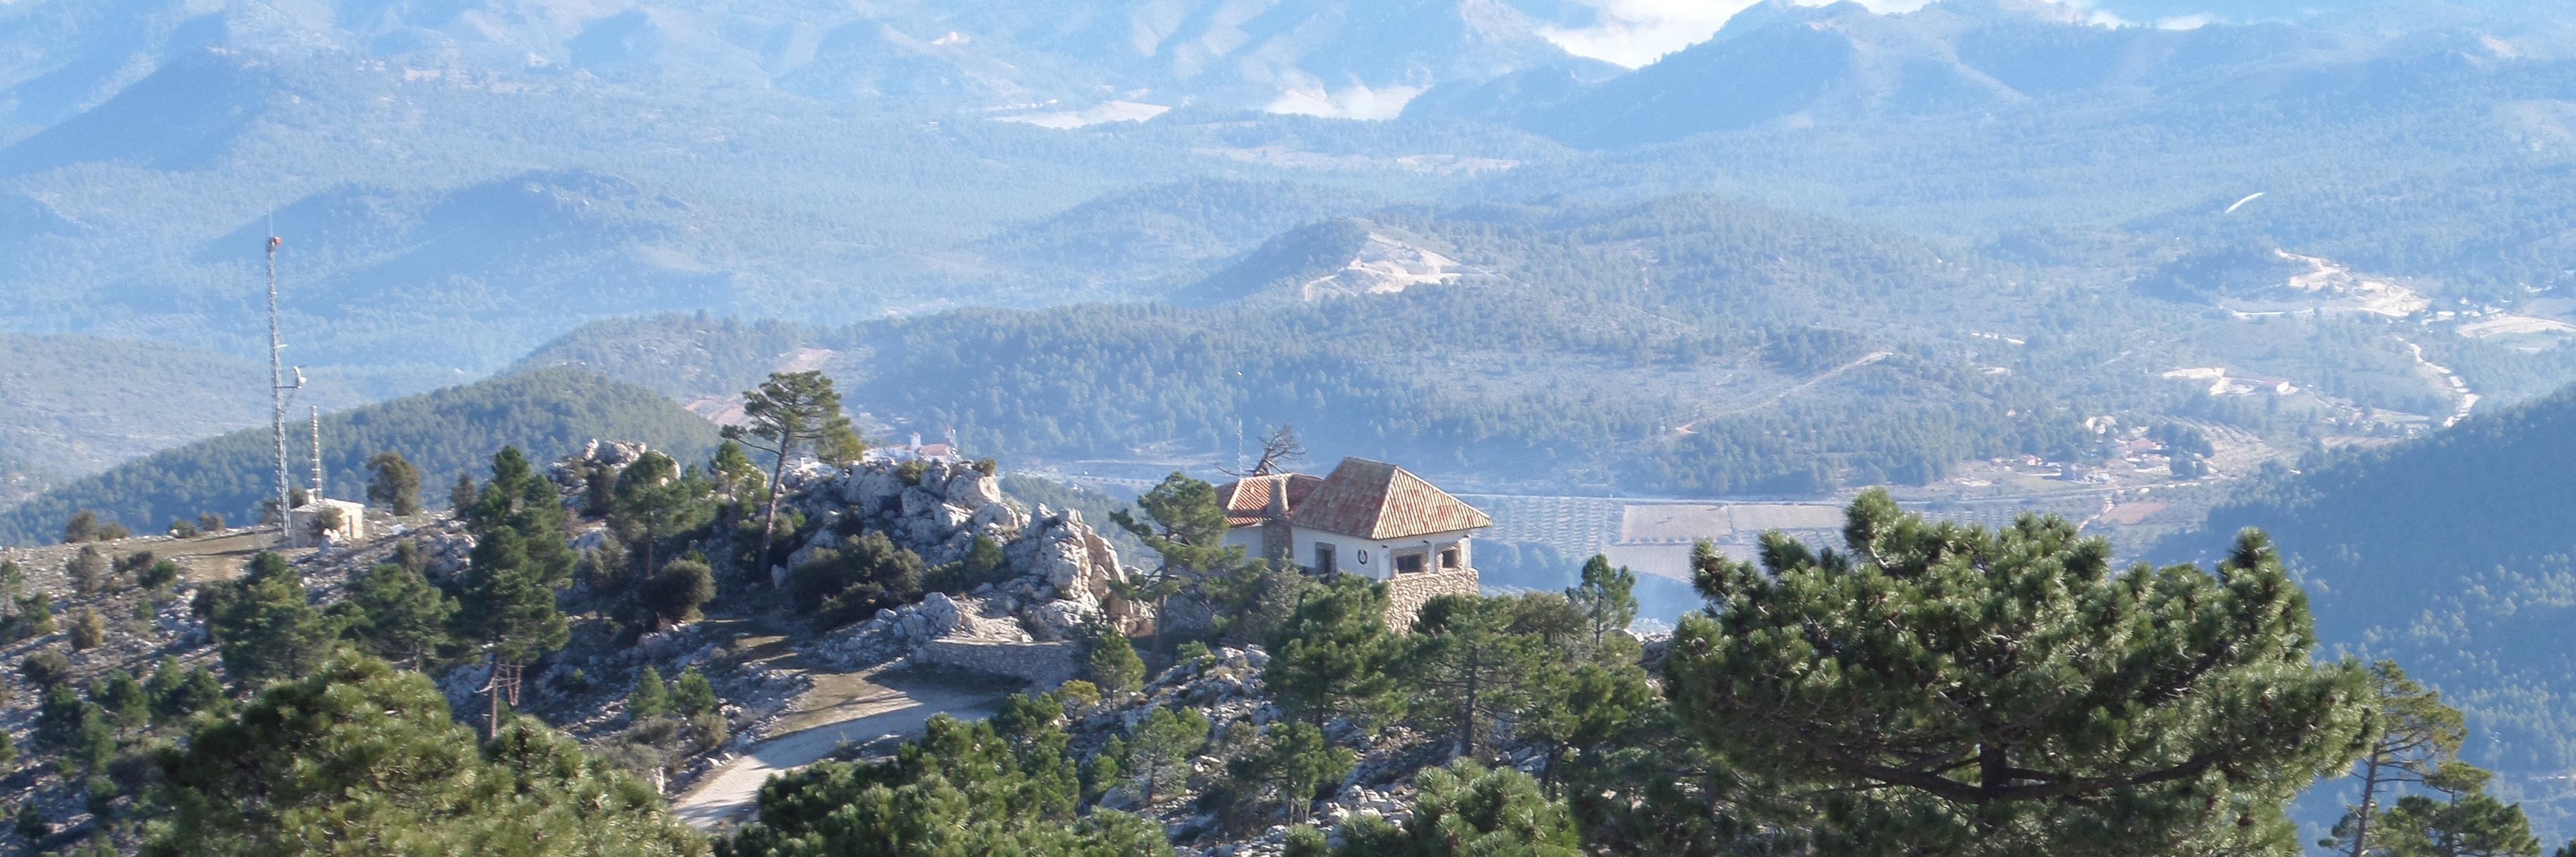 Refugio forestal del monte Ardal.